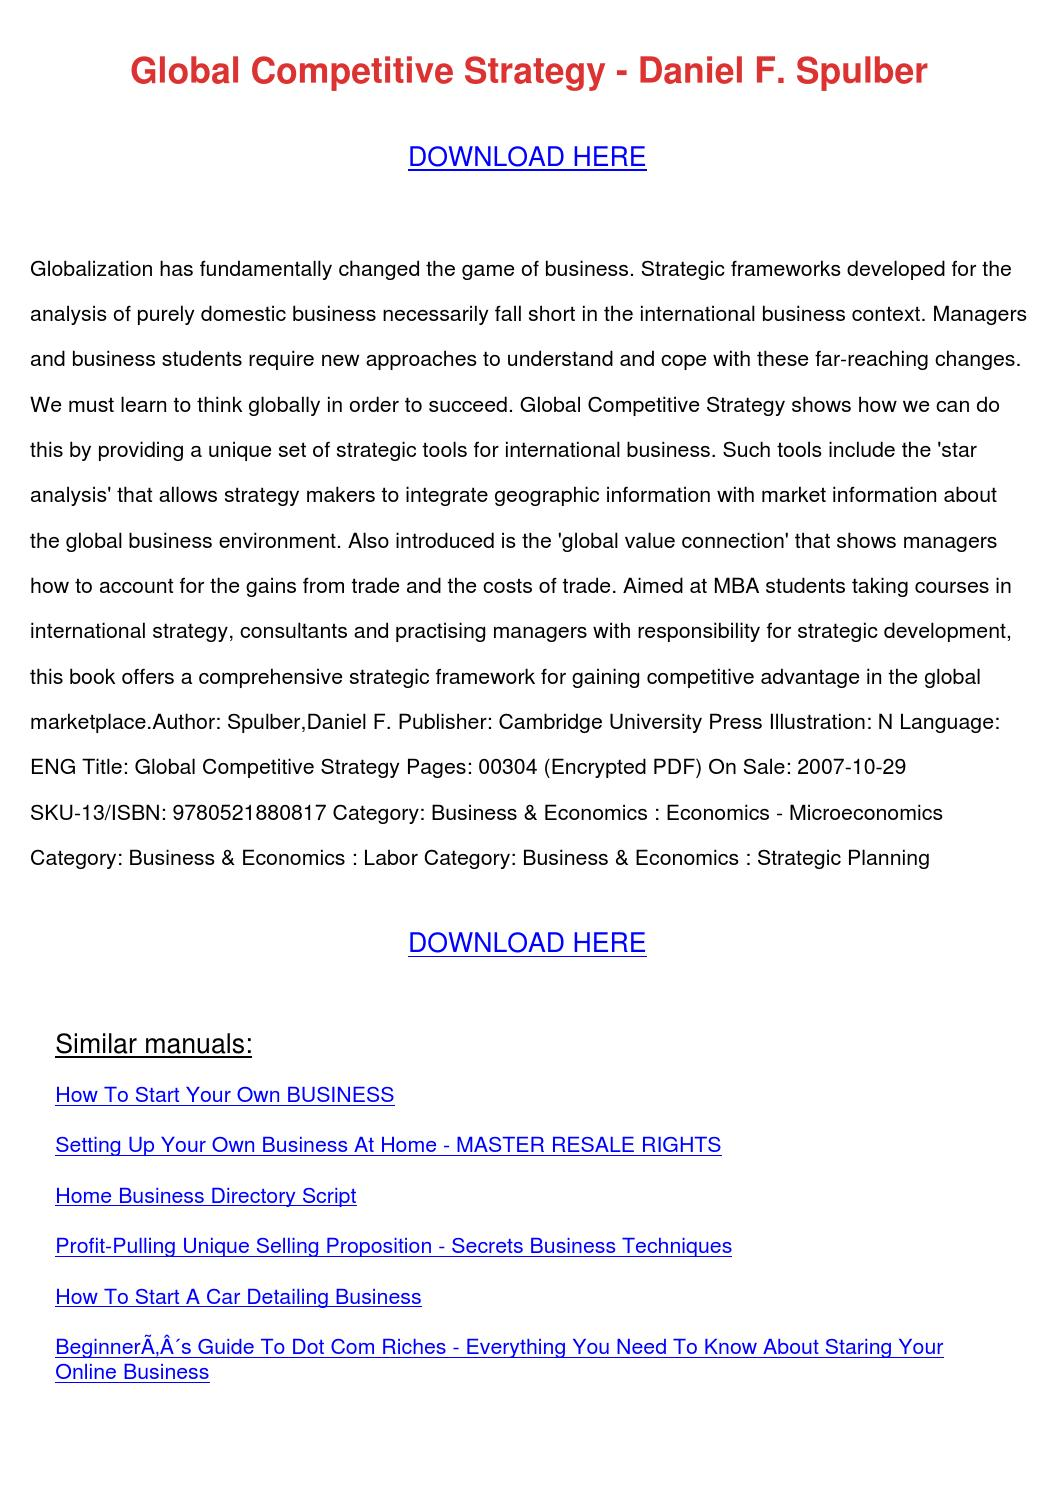 Global Competitive Strategy Daniel F Spulber by JoelHibbard